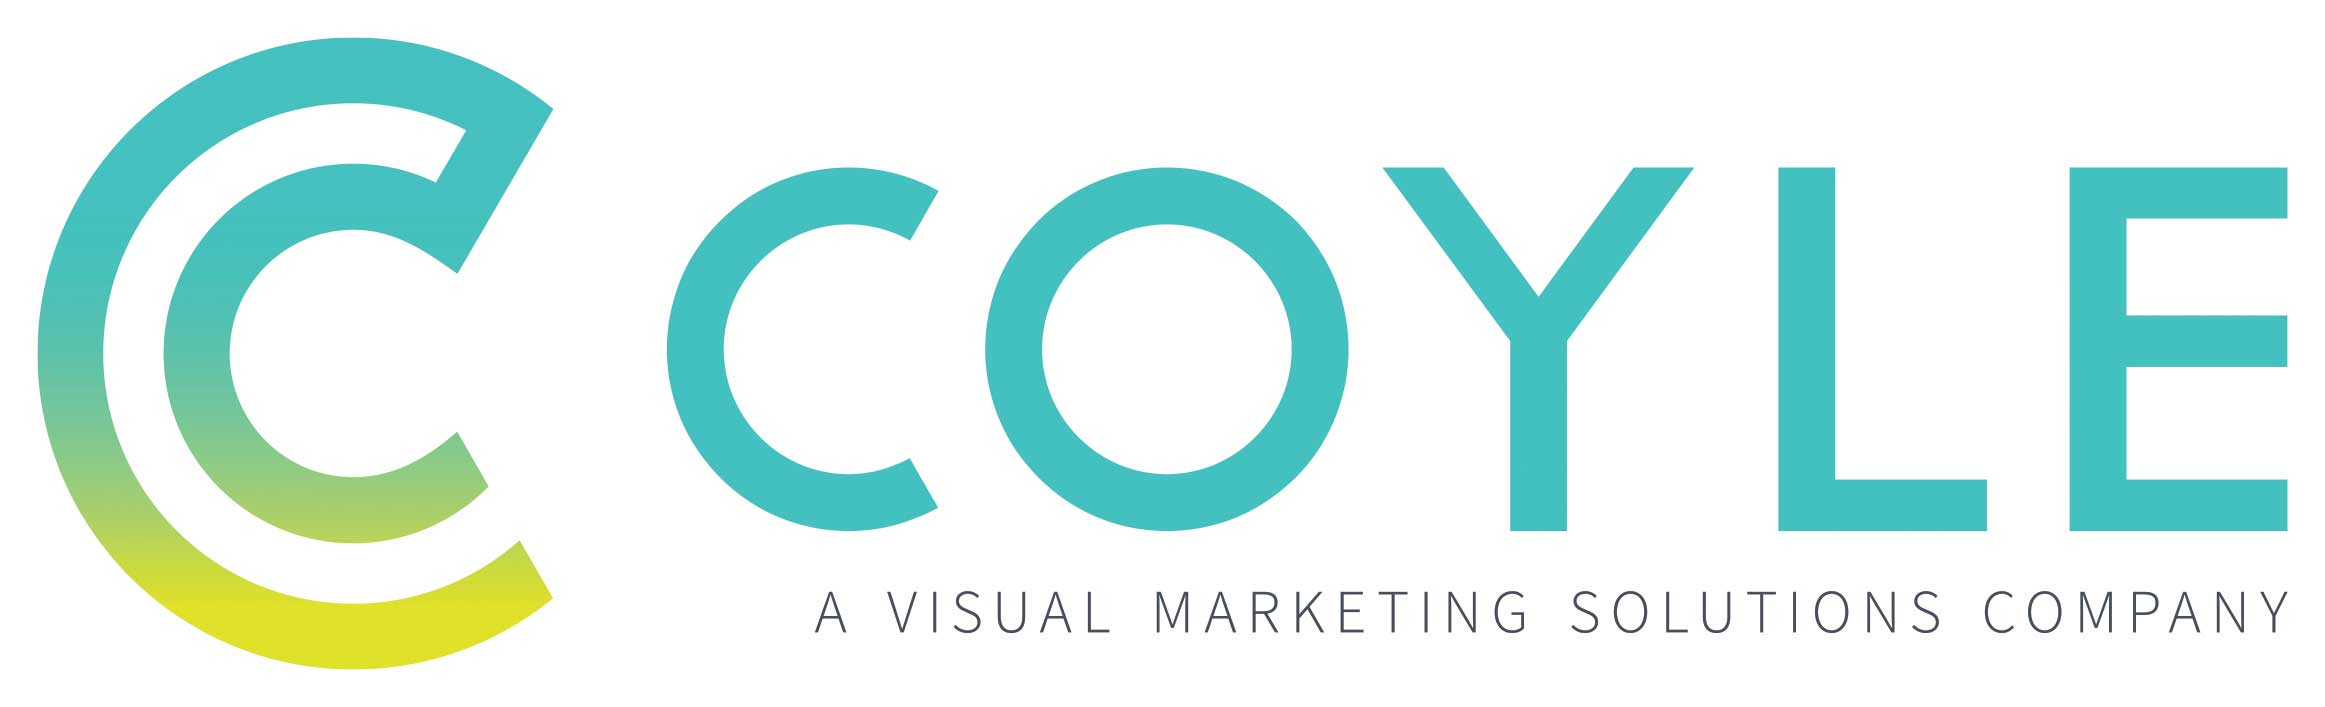 5f18317a8cc4cf001ee95bb8-Coyle-logo